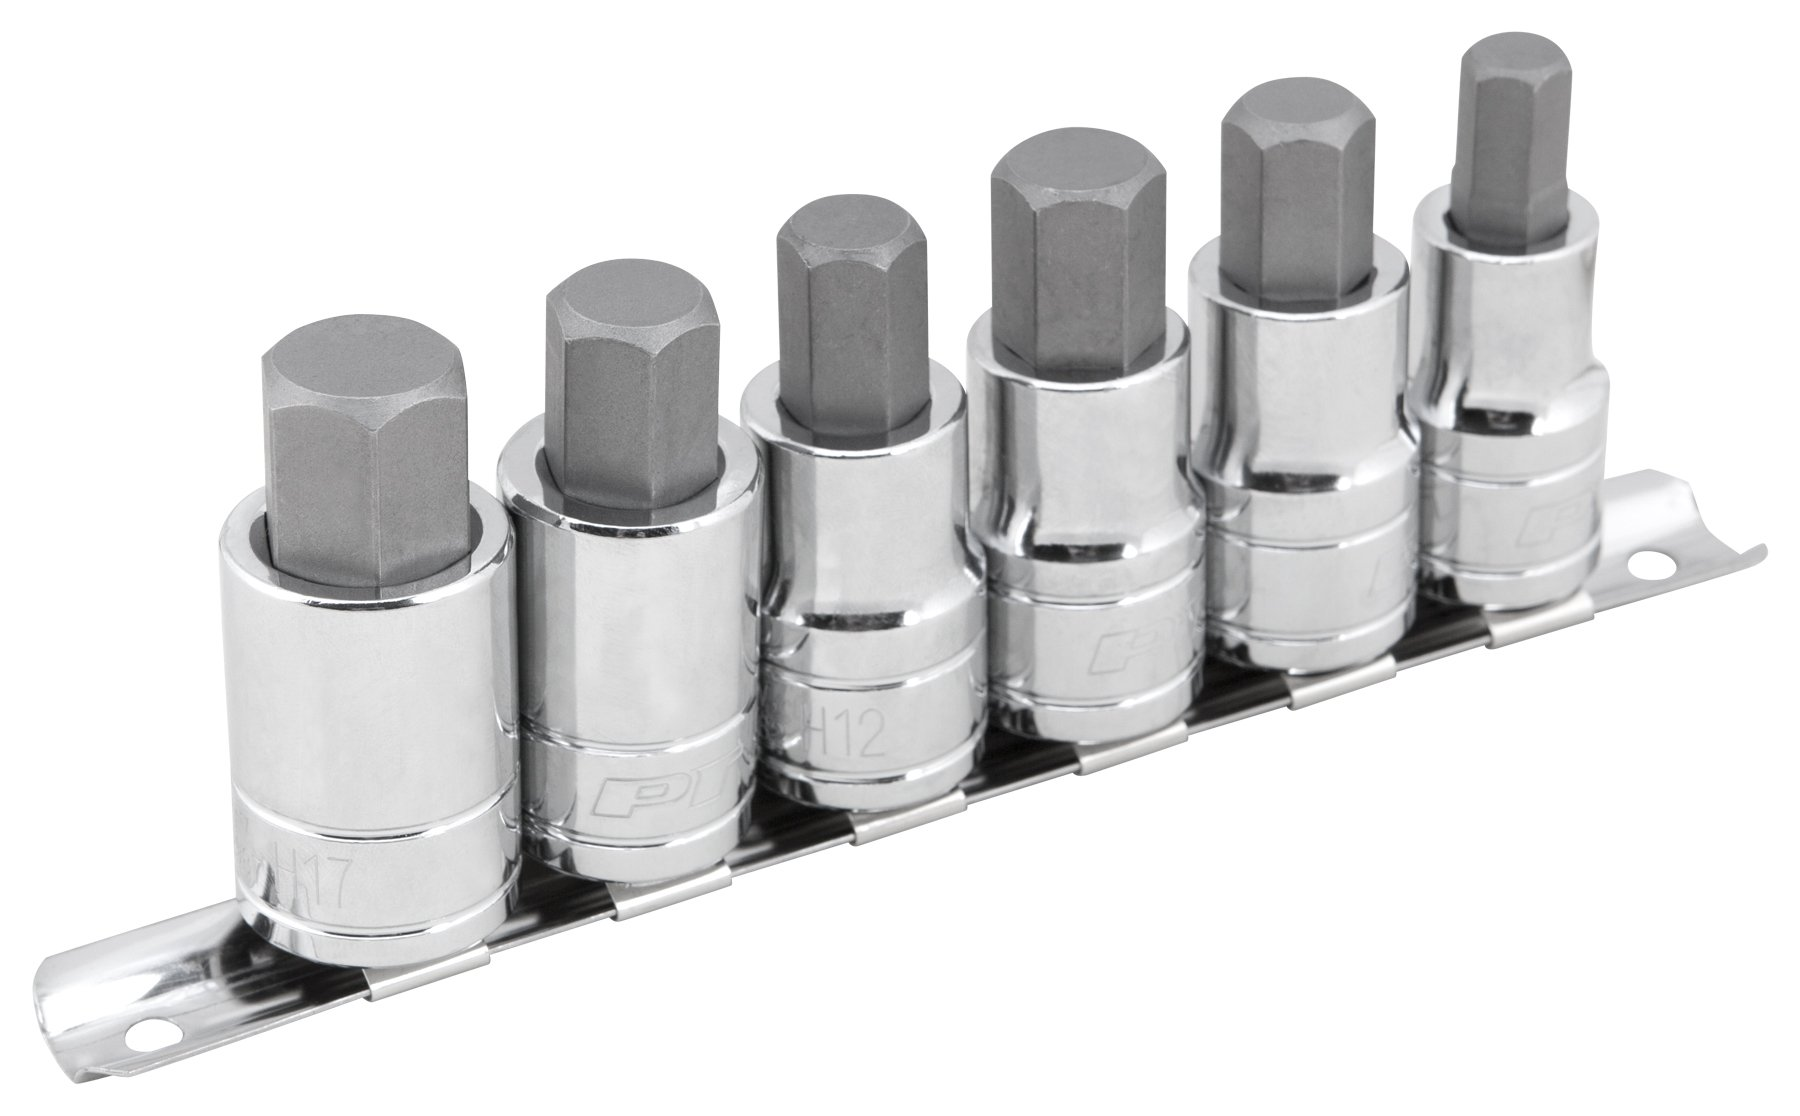 Performance Tool W38886 6 Piece 1/2 Drive Large Hex Bit Socket Set 3/8'', 1/2'', 9/16'', 12 mm, 14 mm, 17 mm, NULL